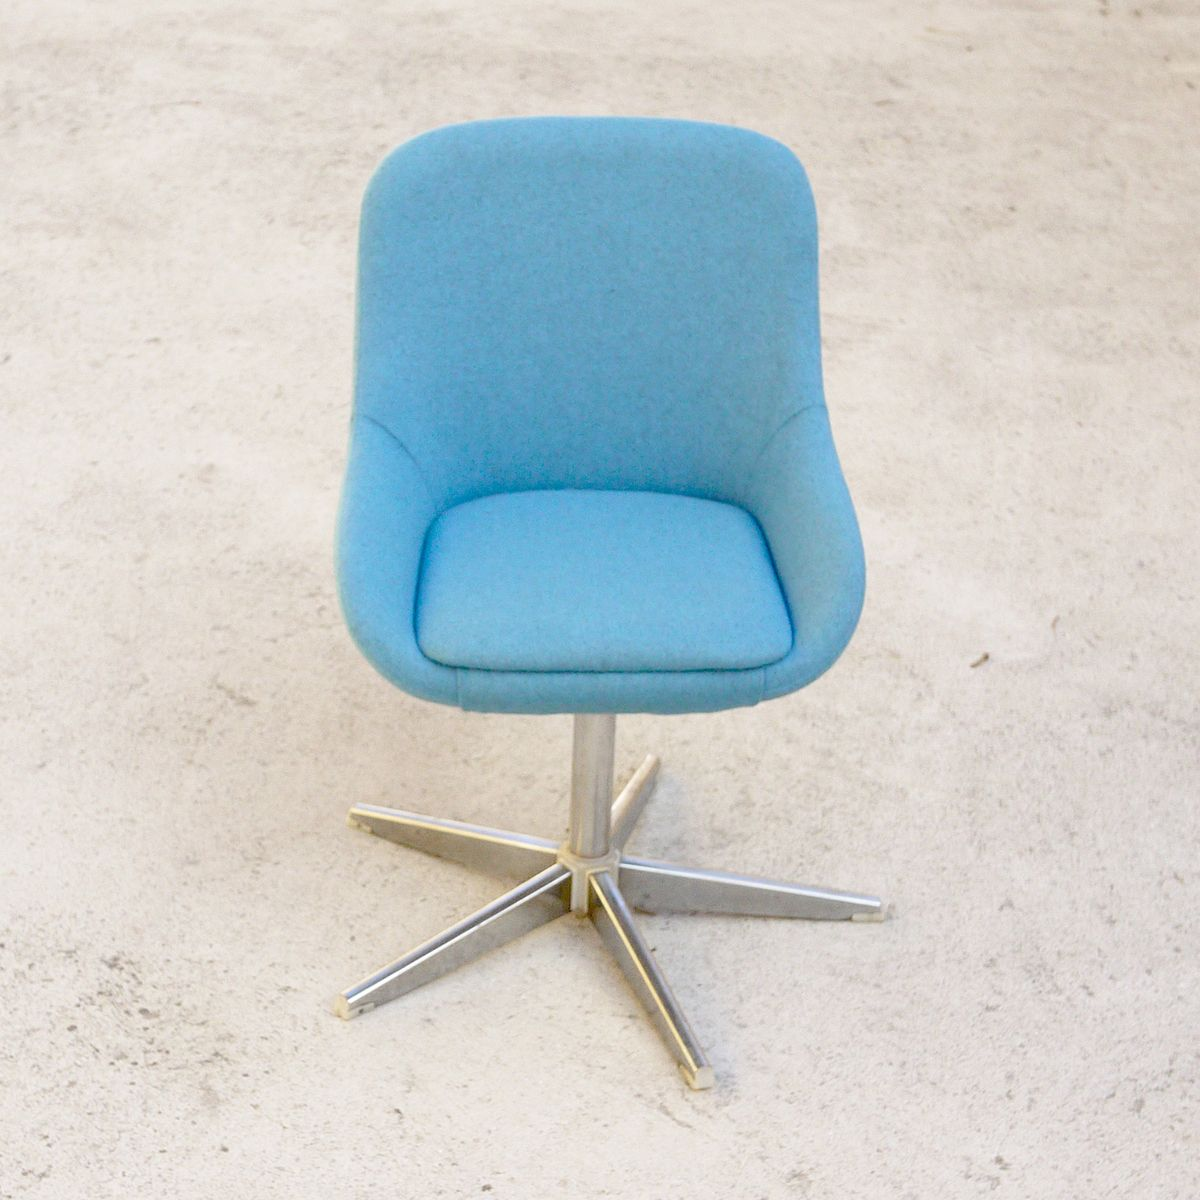 97 Aqua Desk Chair Ave Six Emerson Student Office